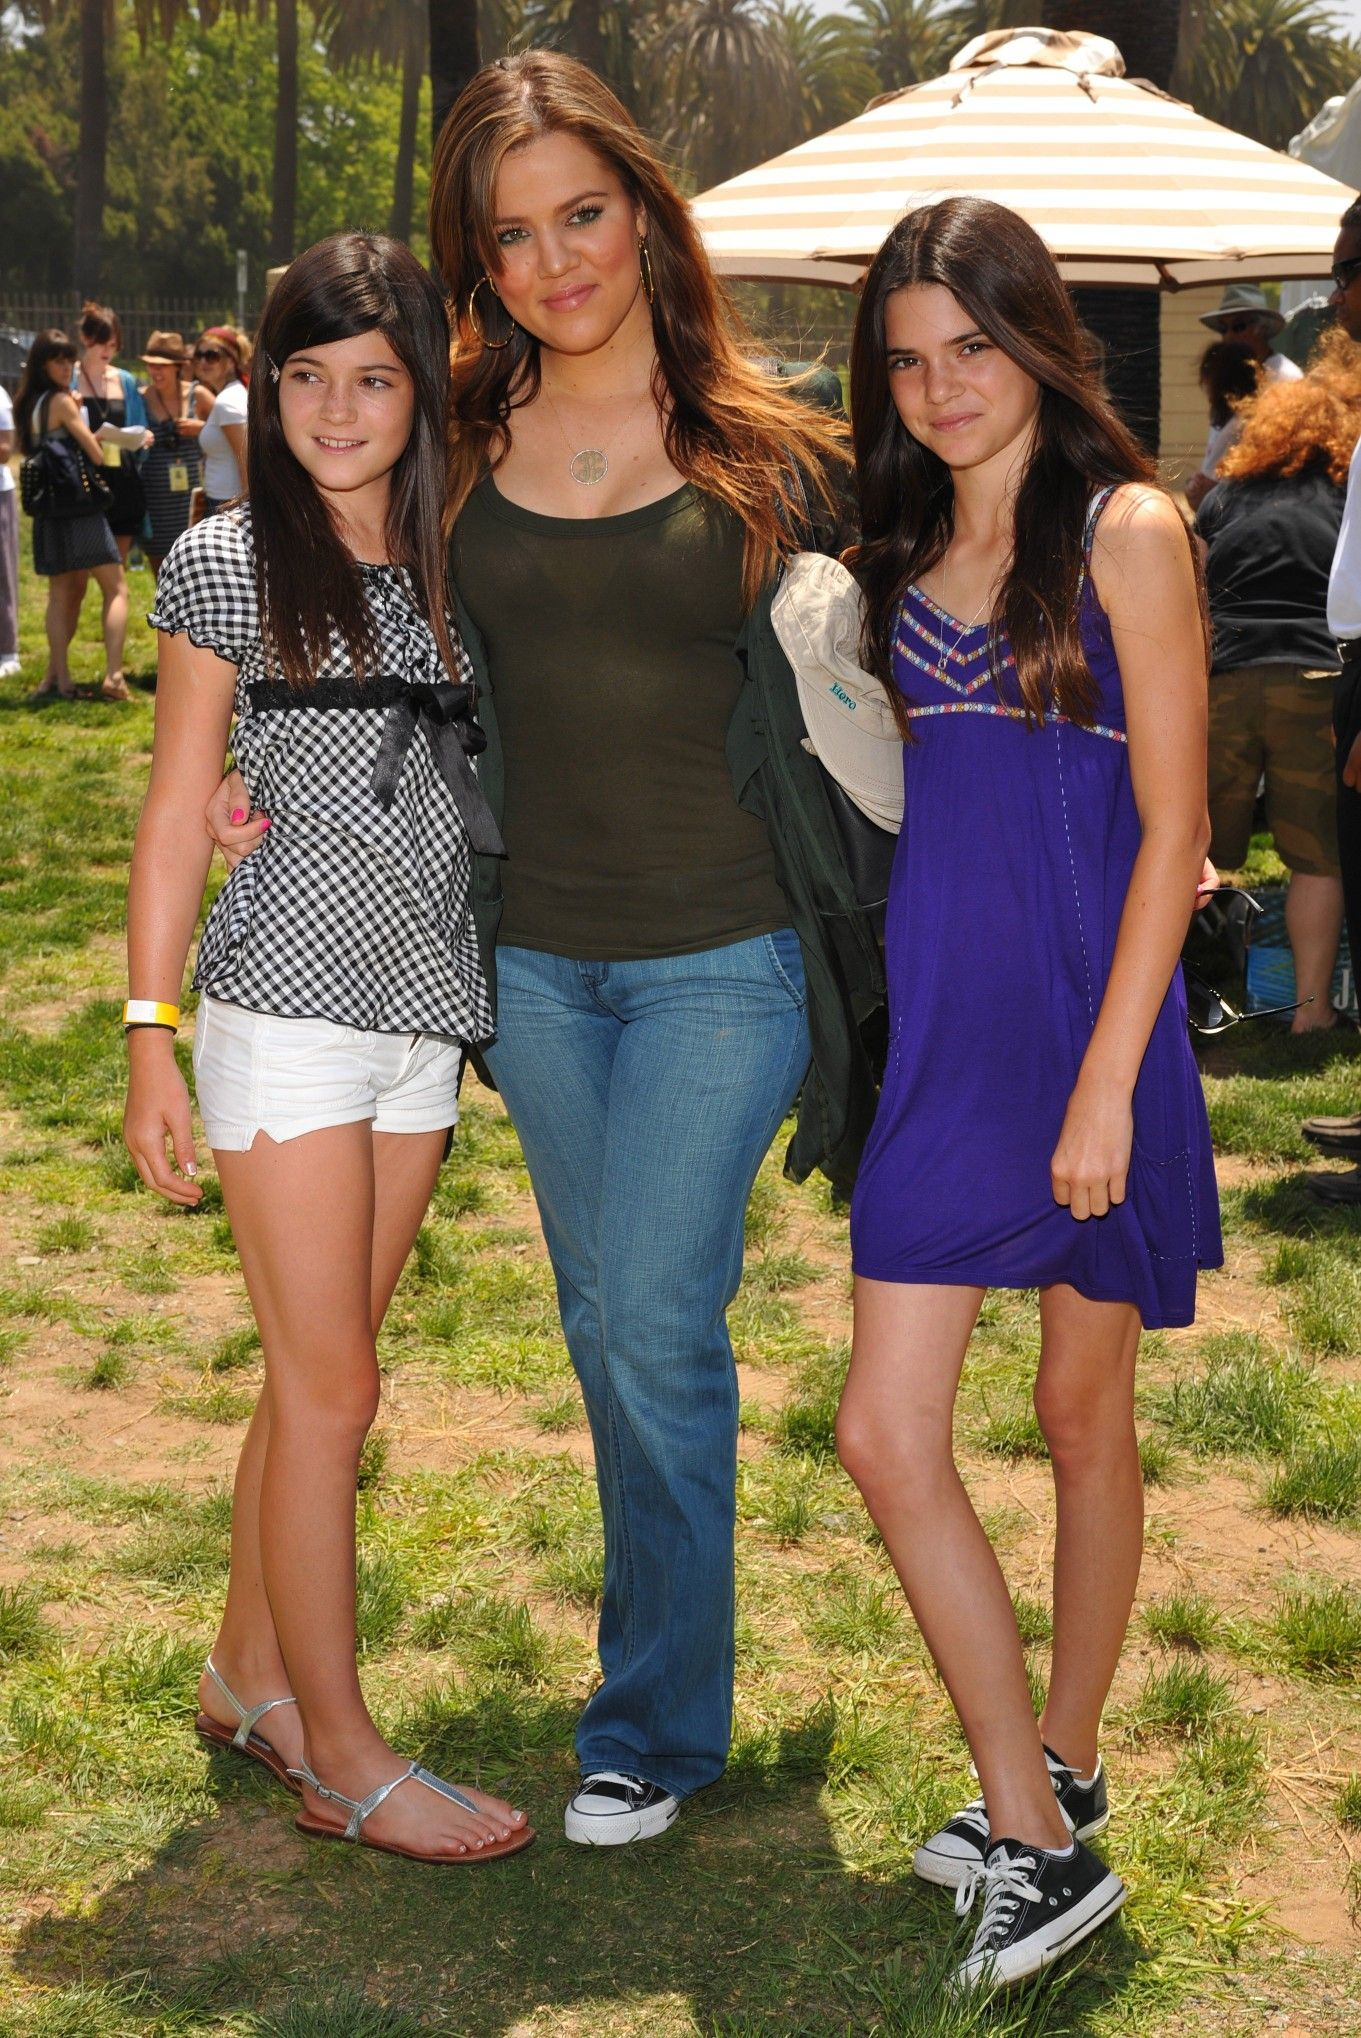 Kylie Jenner Khloe Kardashian And Kendall Jenner Kardashian Kids Kardashian Kyle Jenner